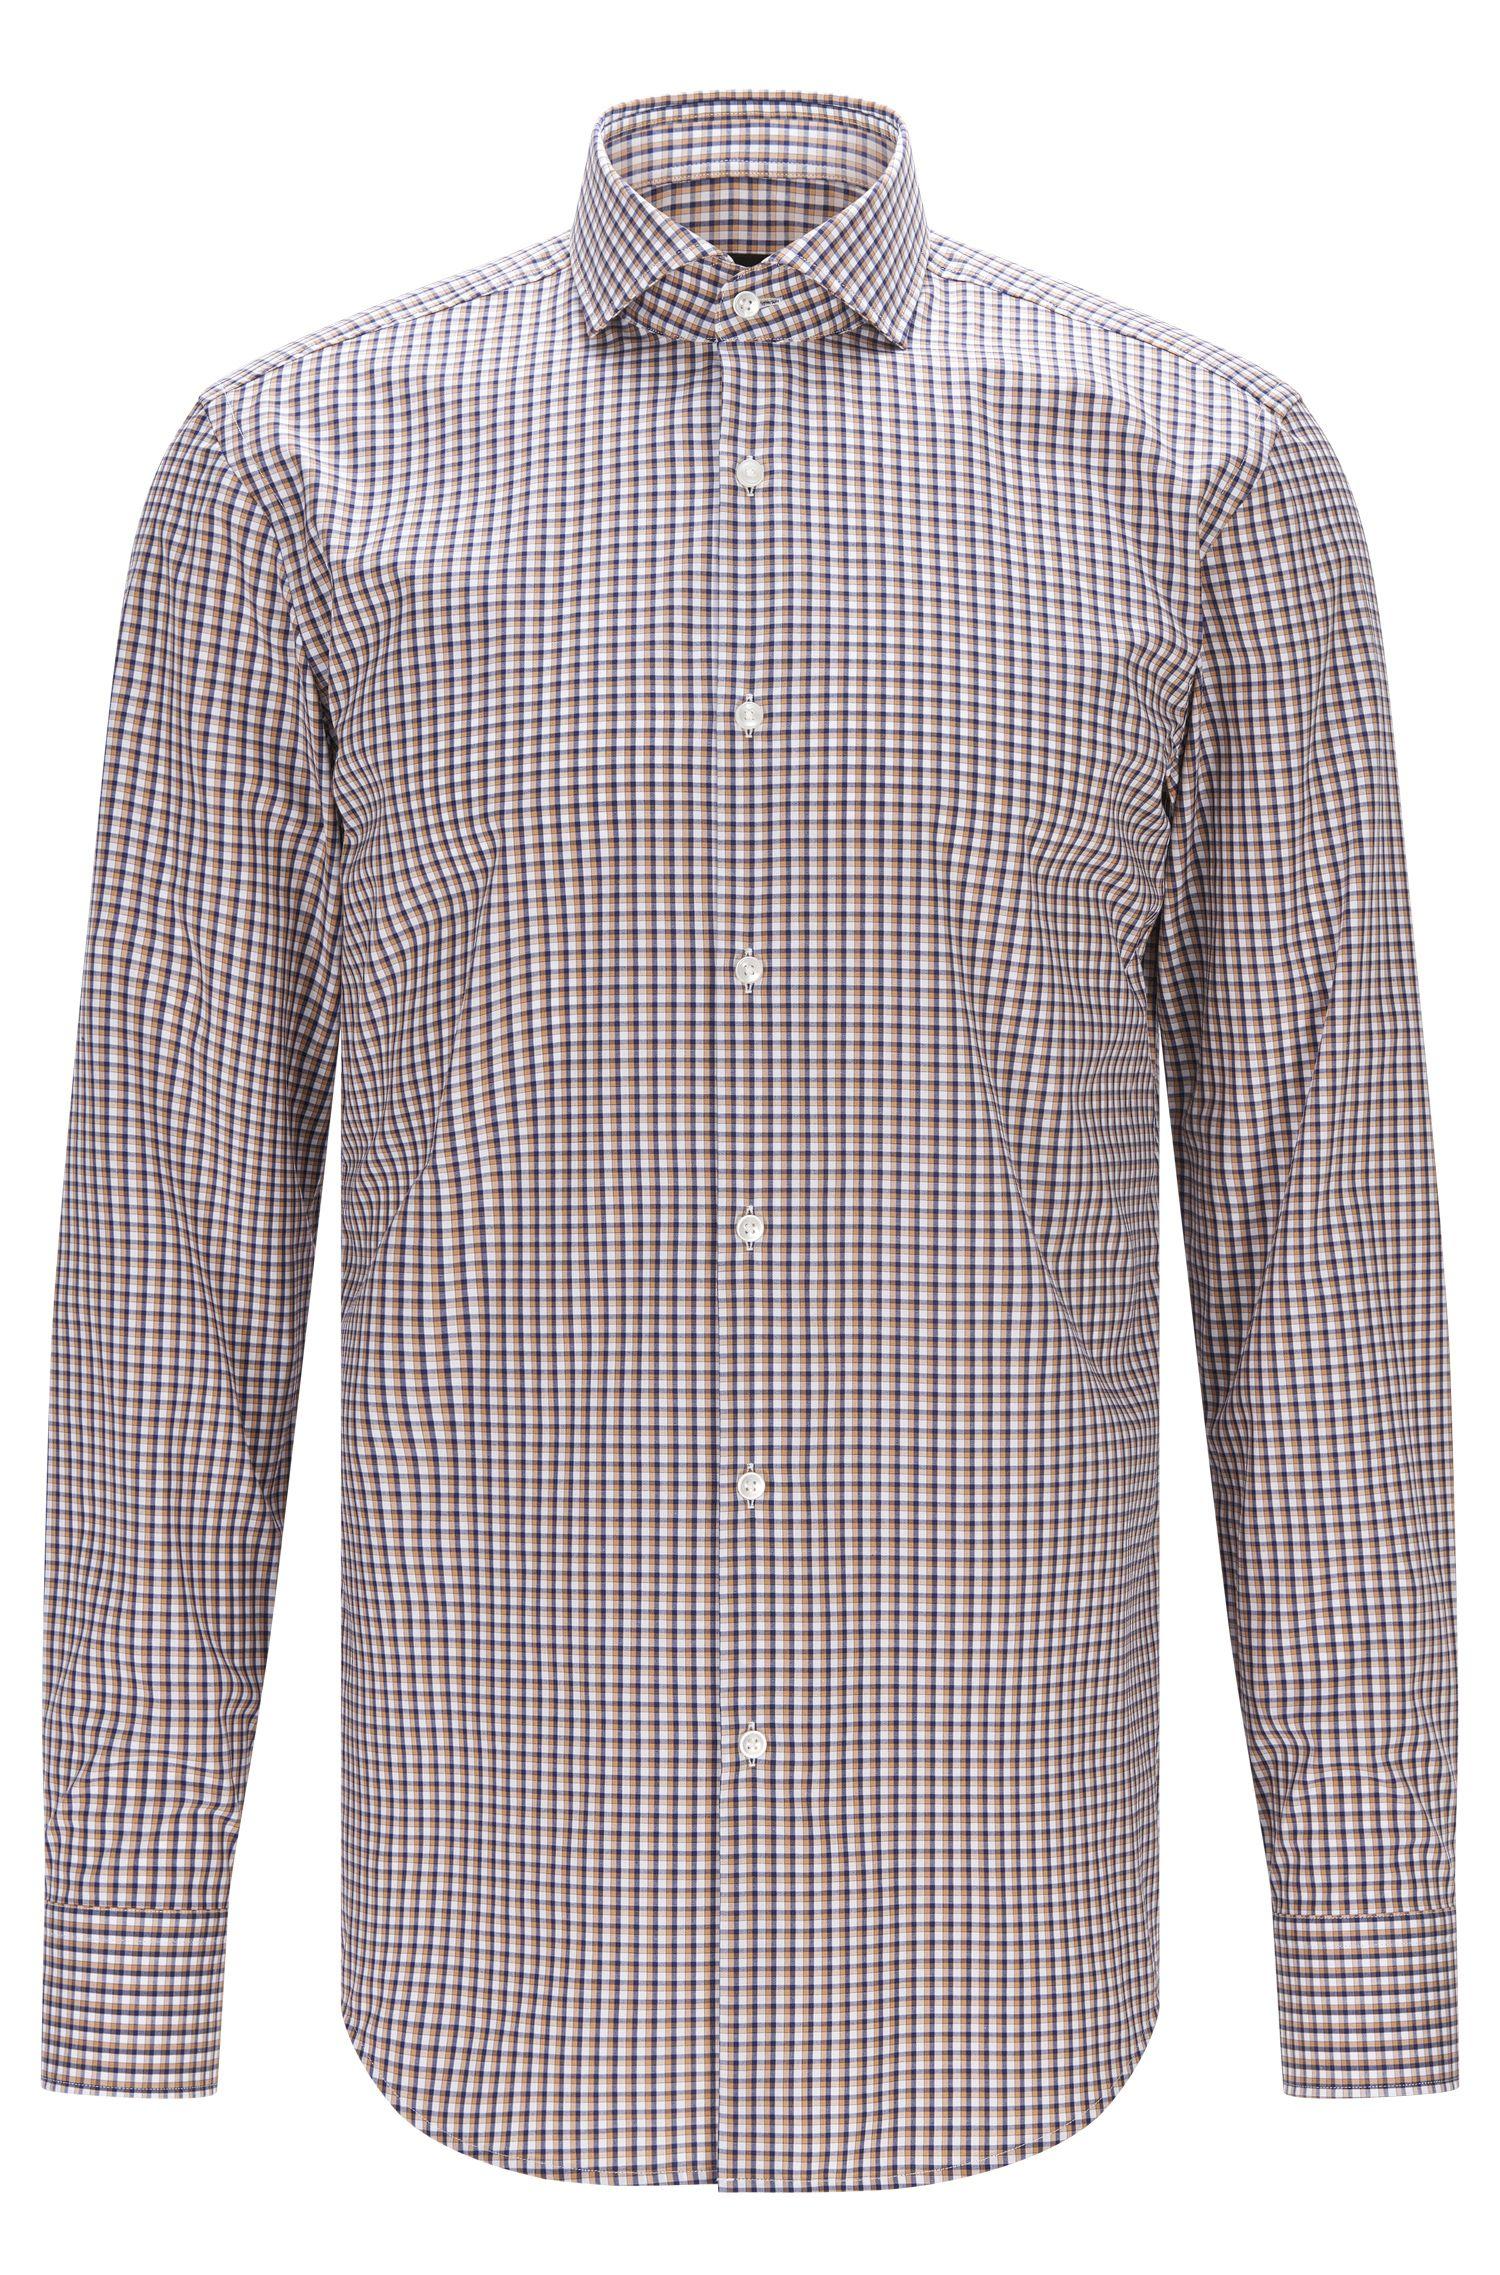 Checked Easy Iron Cotton Dress Shirt, Slim Fit | Jason